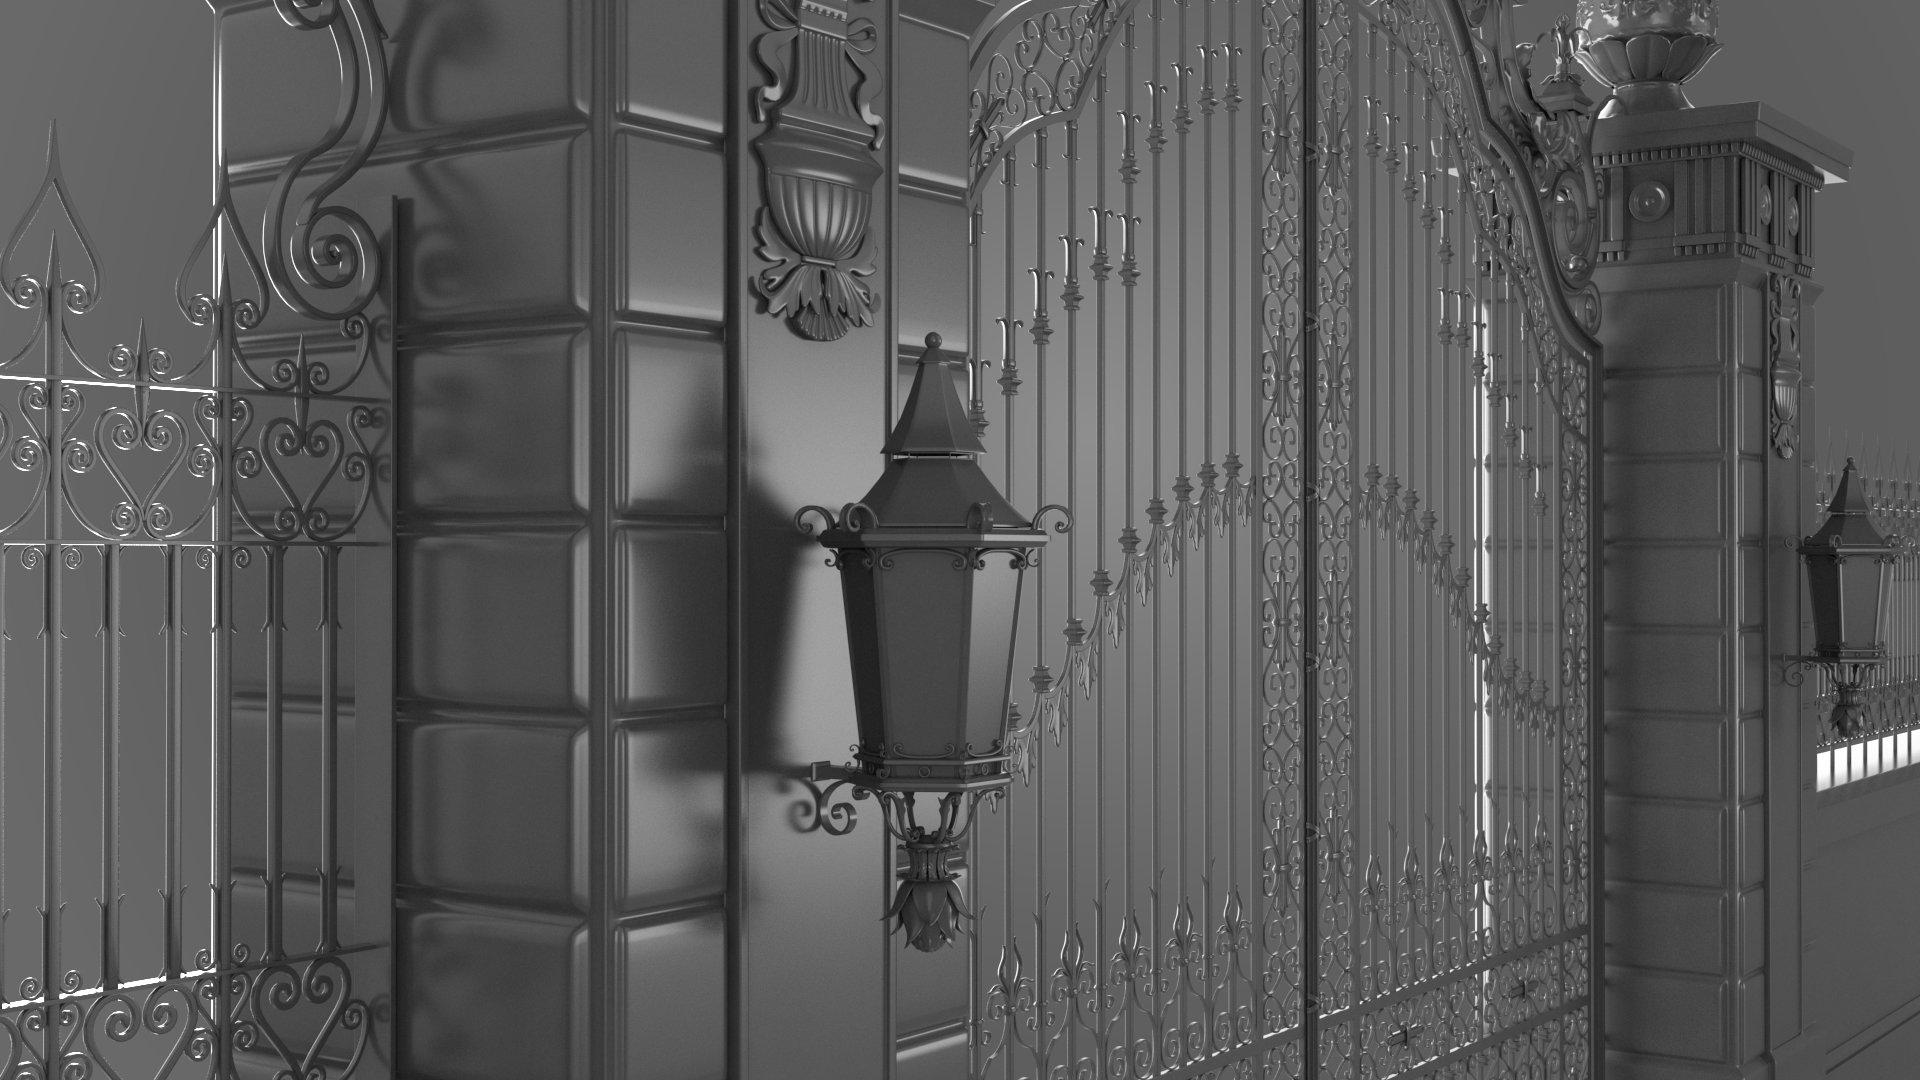 Stavros fylladitis gate 01